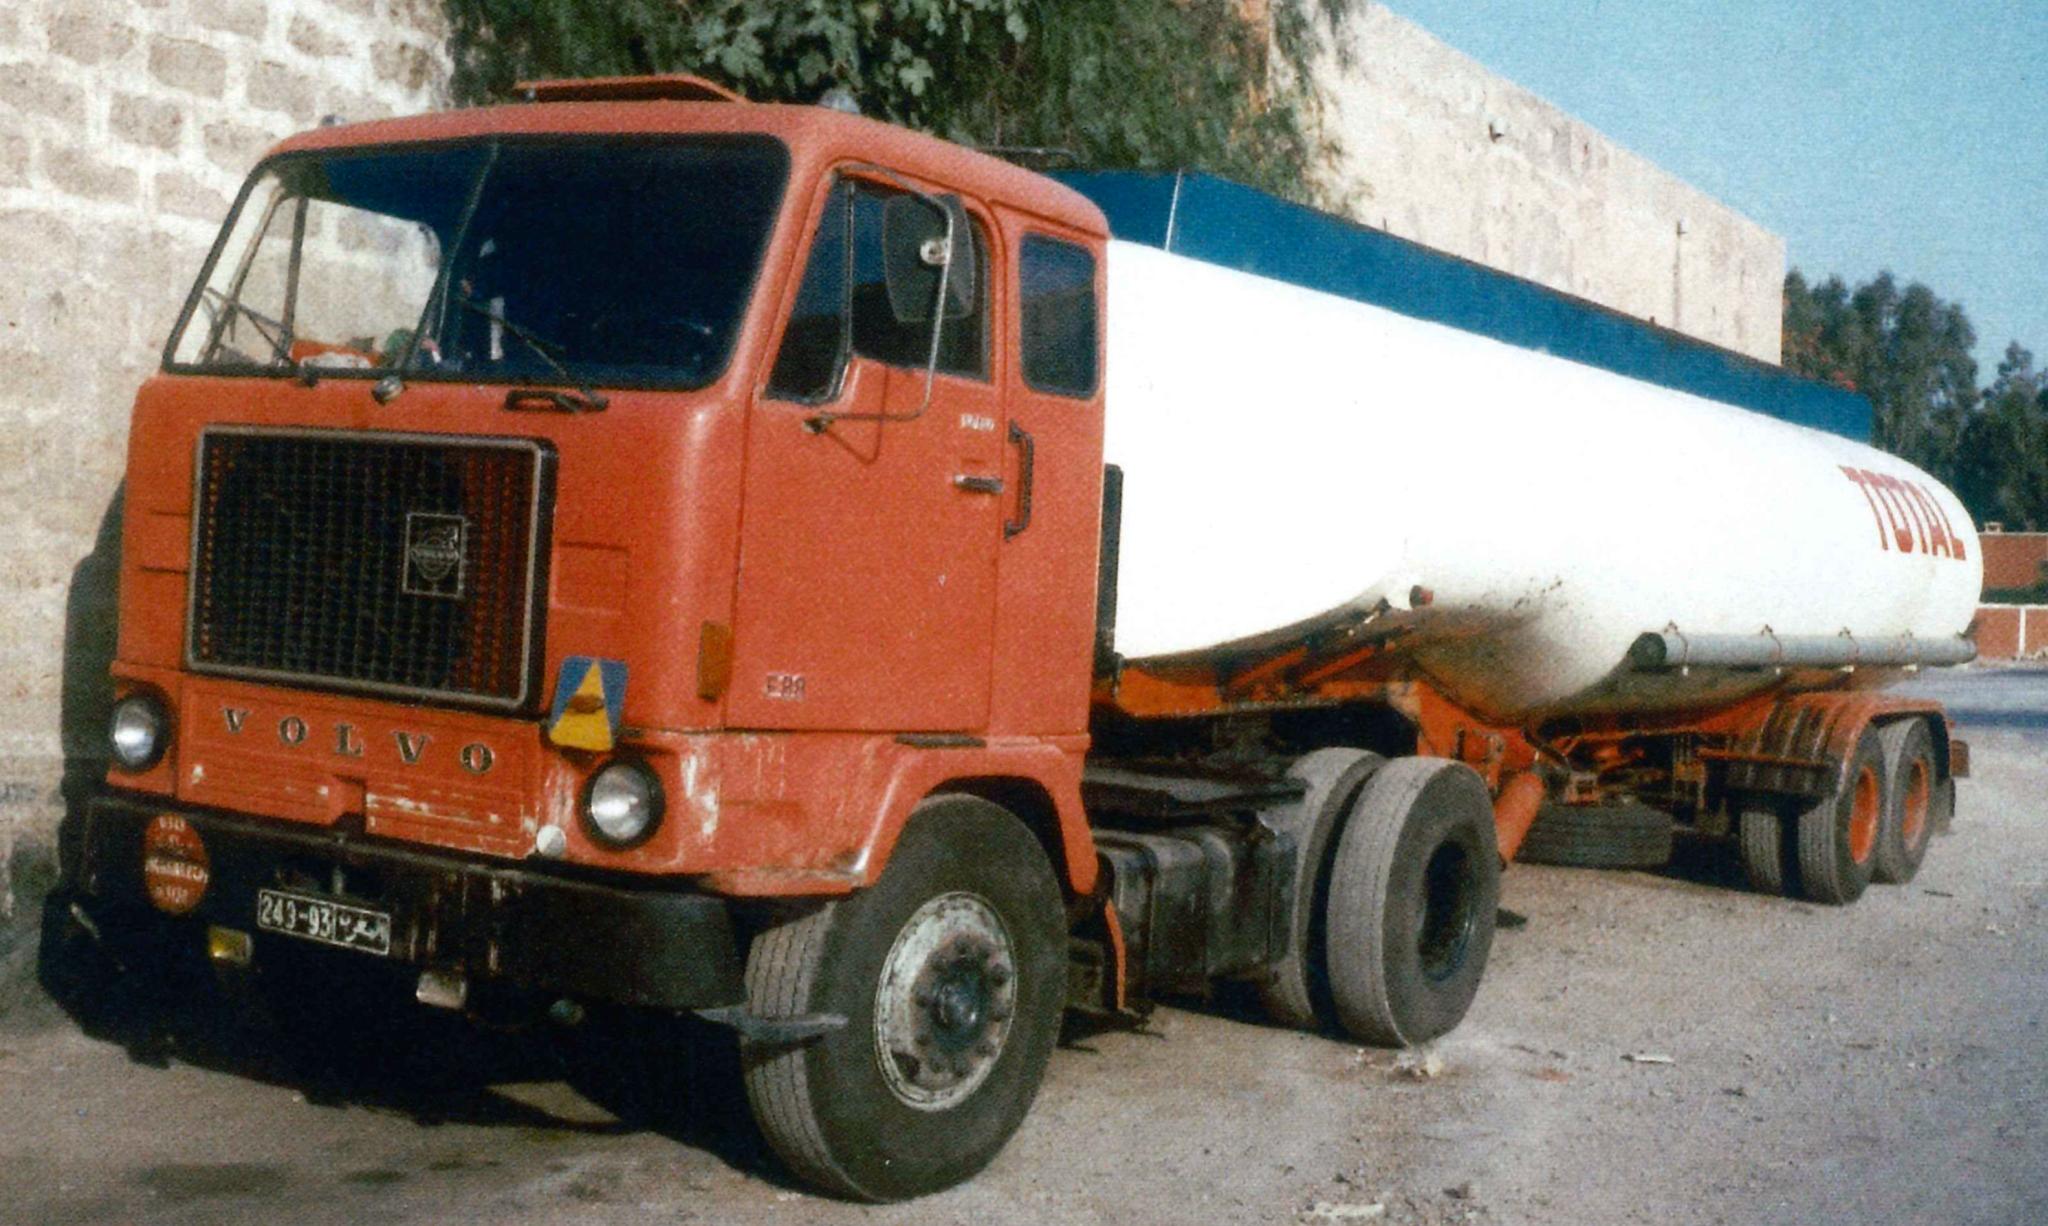 Transport Routier au Maroc - Histoire - Page 2 49787580537_e2db635daf_o_d